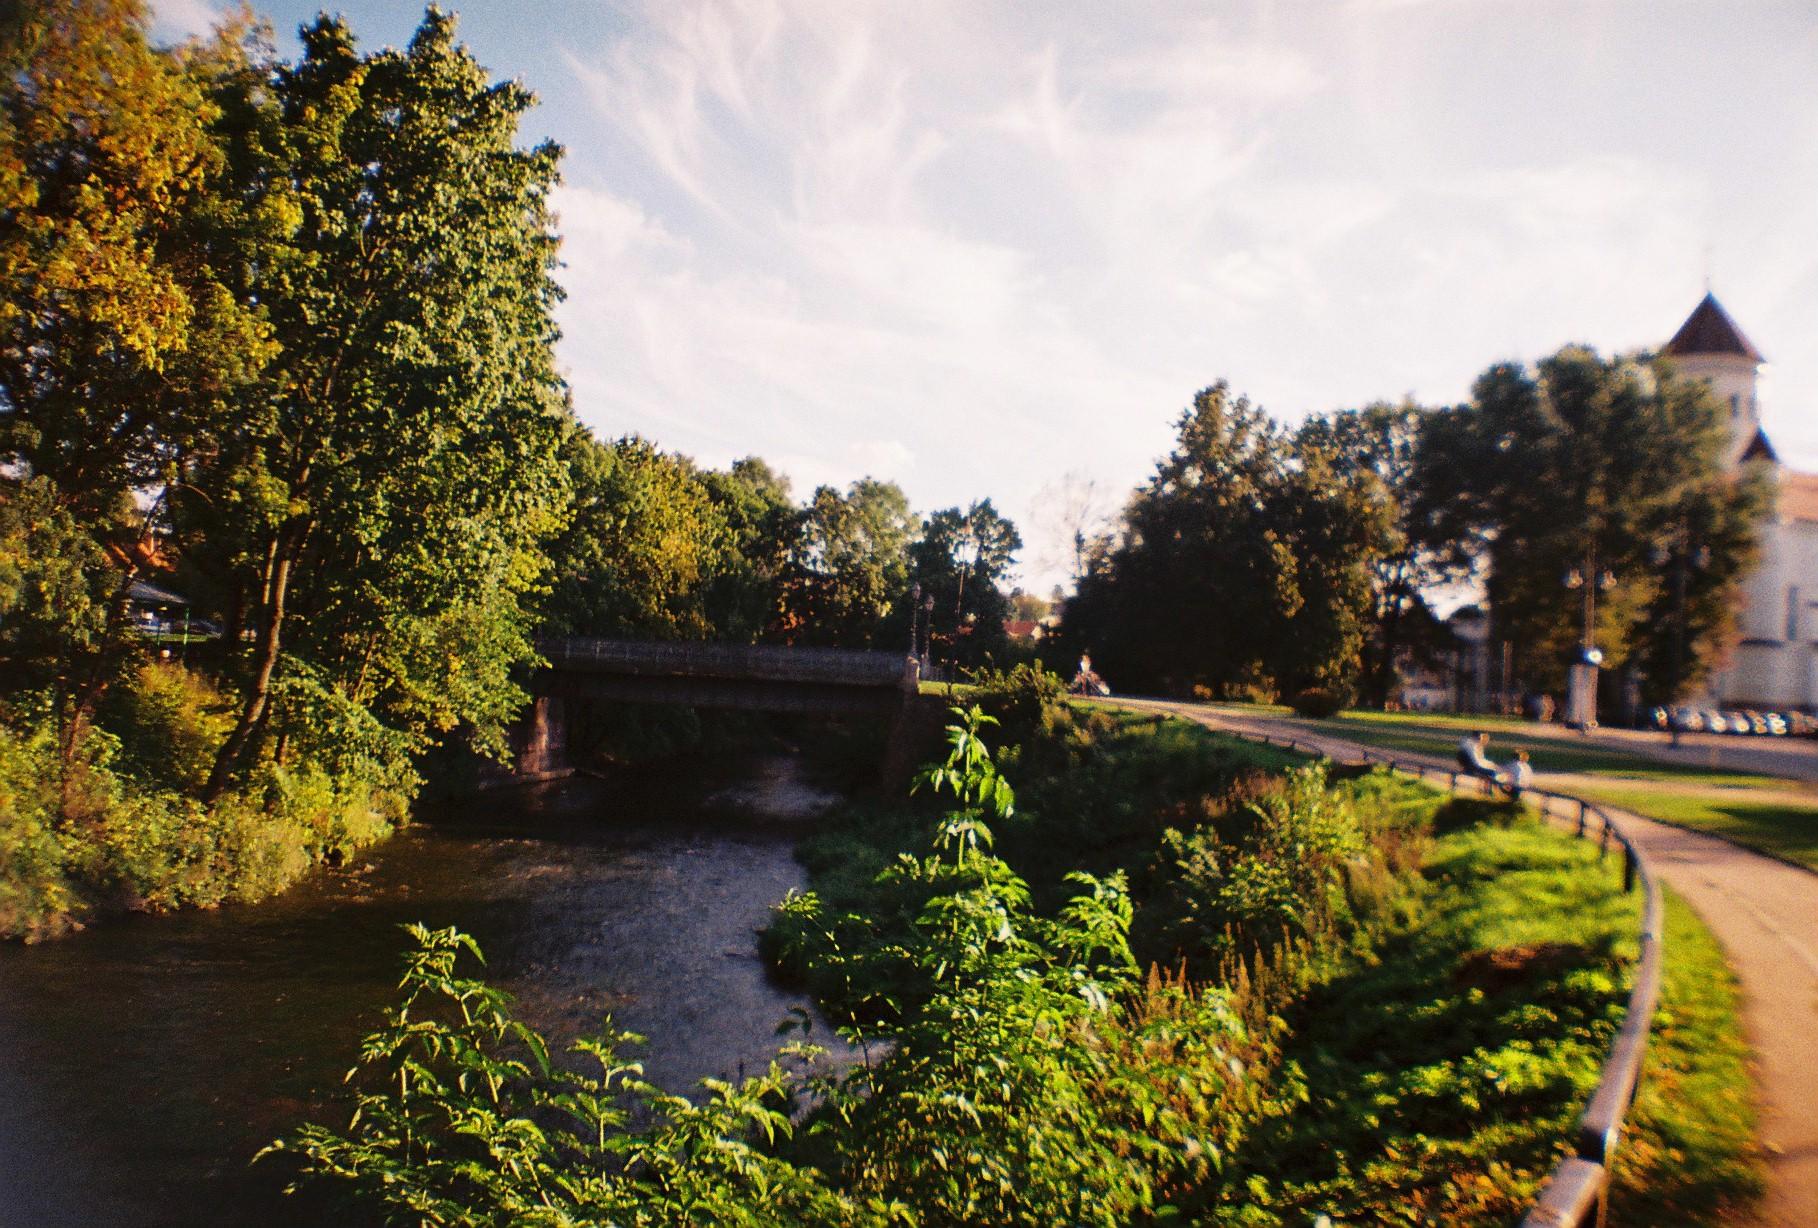 Bernardinai Garden